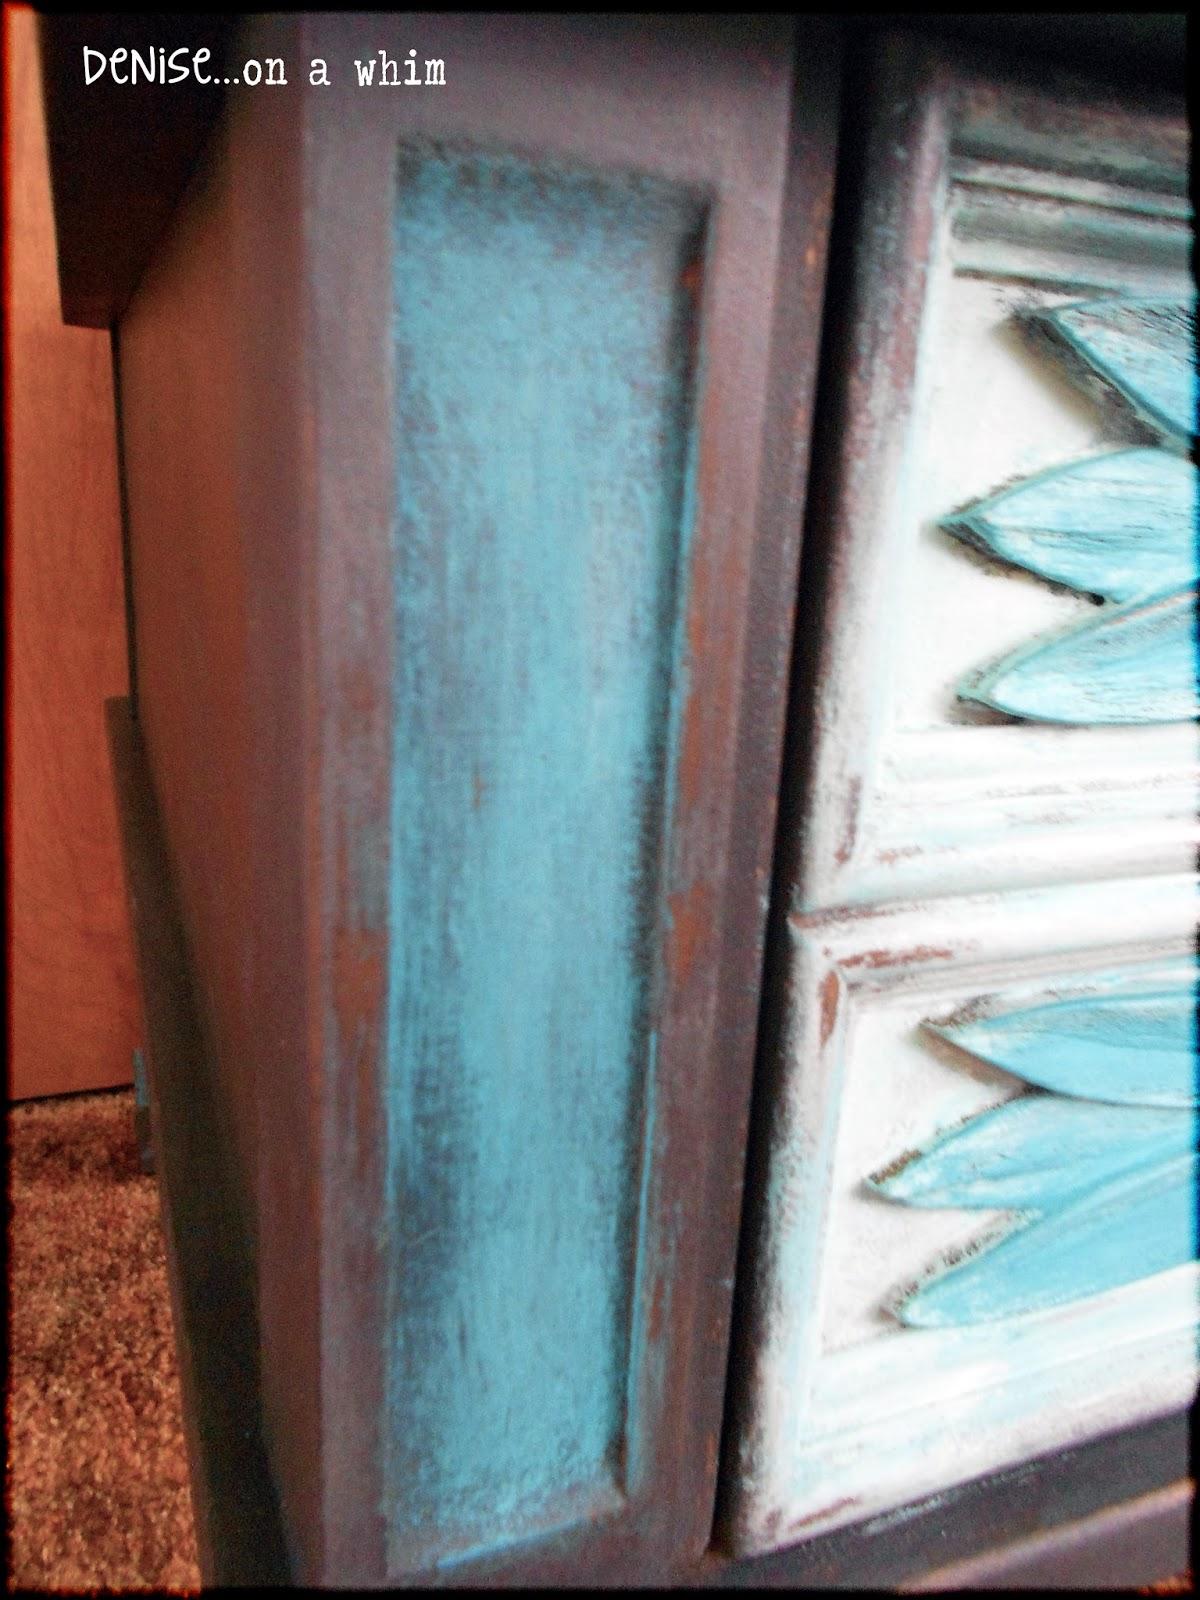 American Paint Company's Peacock via http://deniseonawhim.blogspot.com